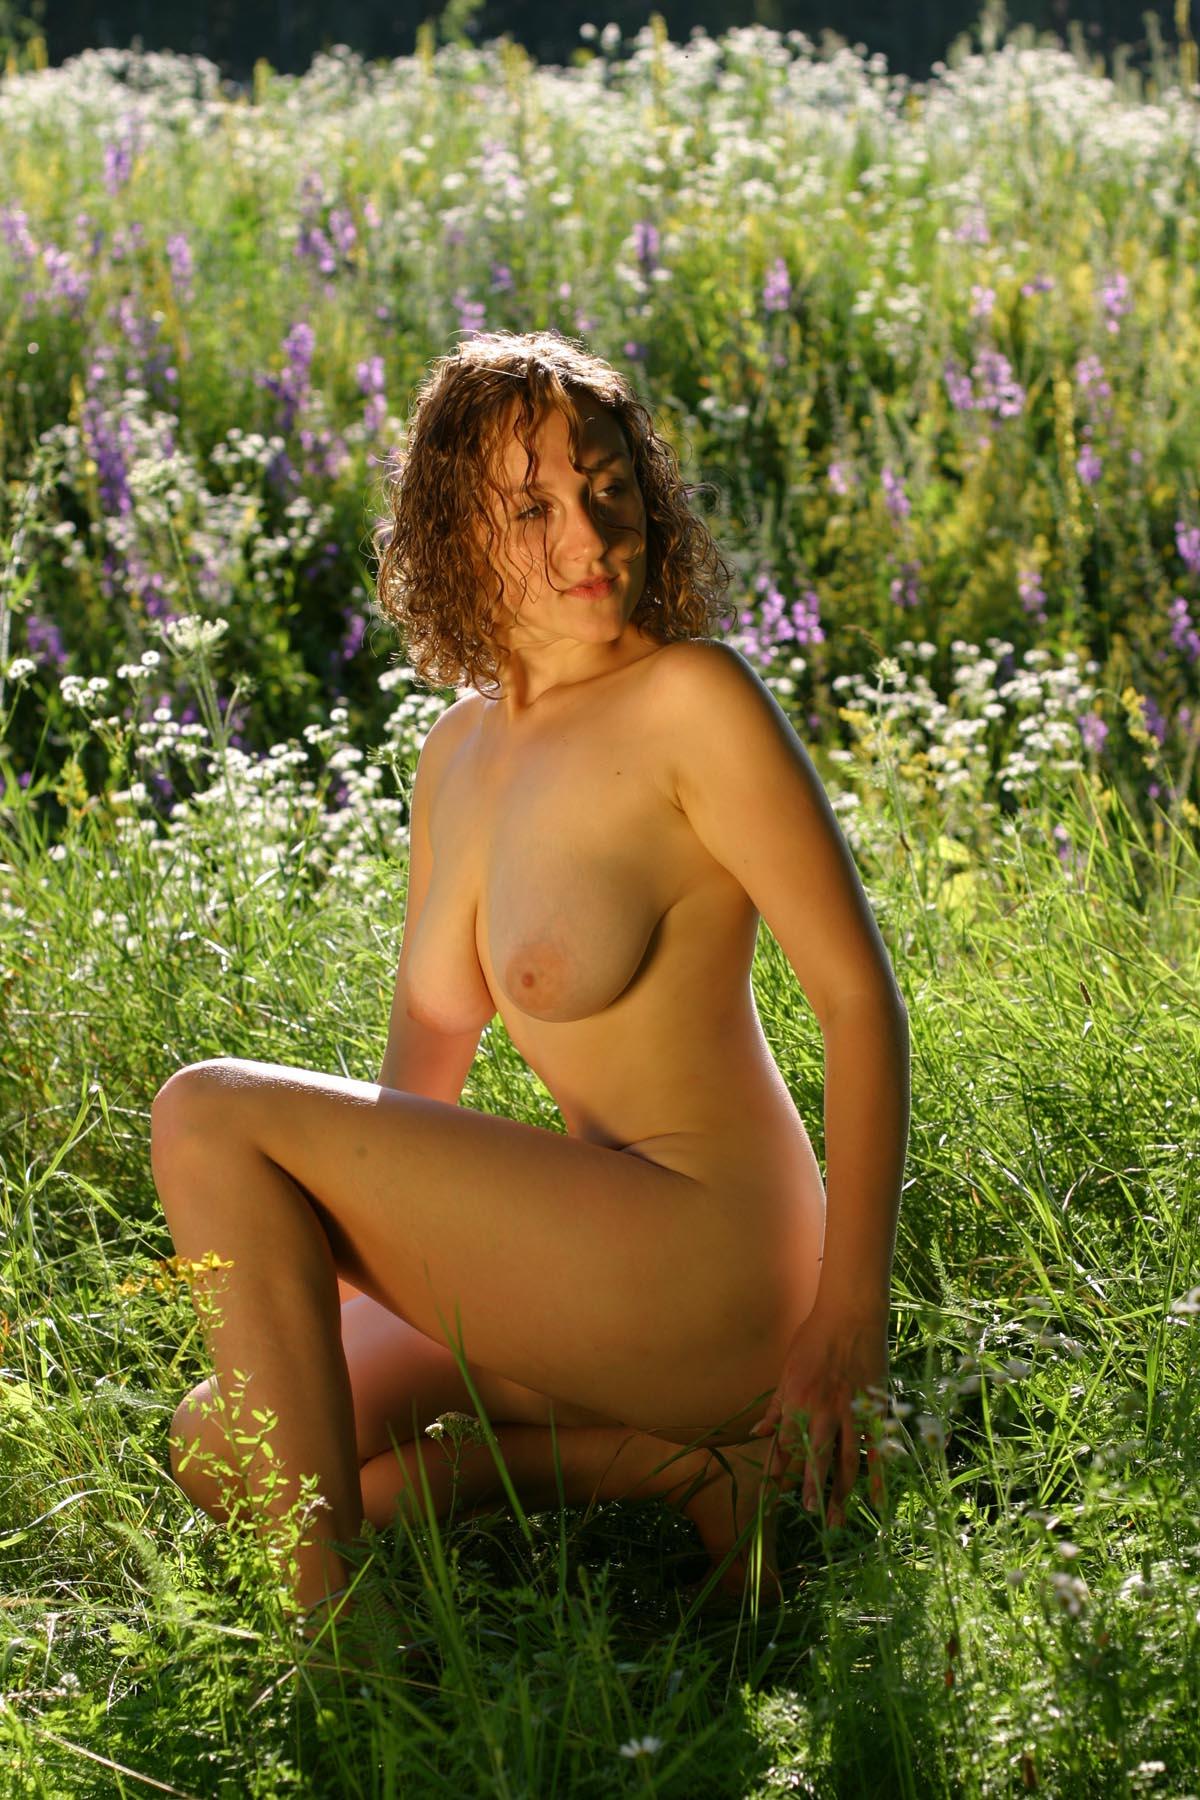 Girls nude russian outdoors hot